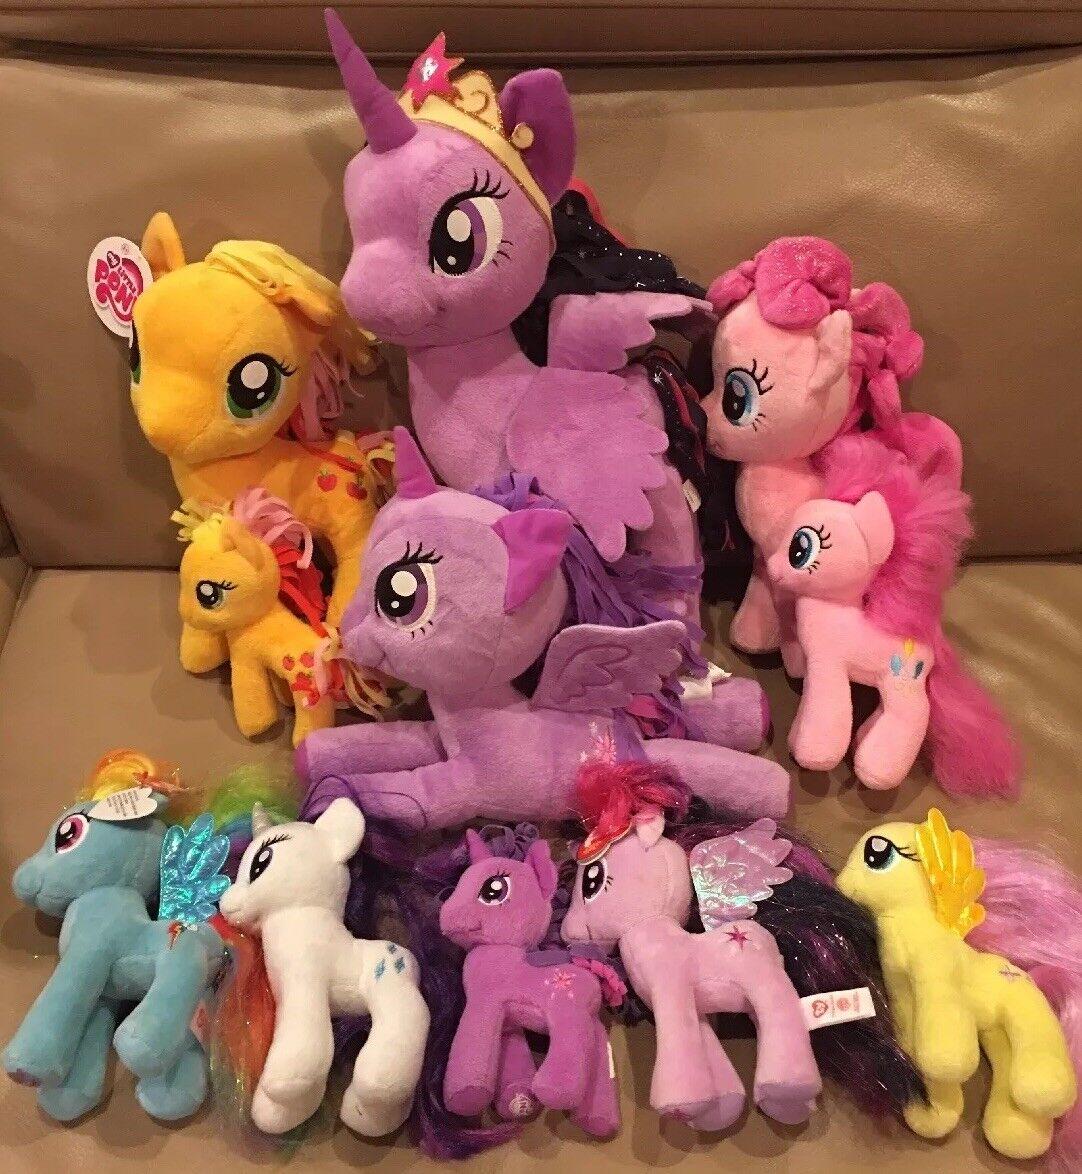 11 MY LITTLE PONY Plush LOT TY Funrise Aurora Unicorn Princess Twilight Sparkle